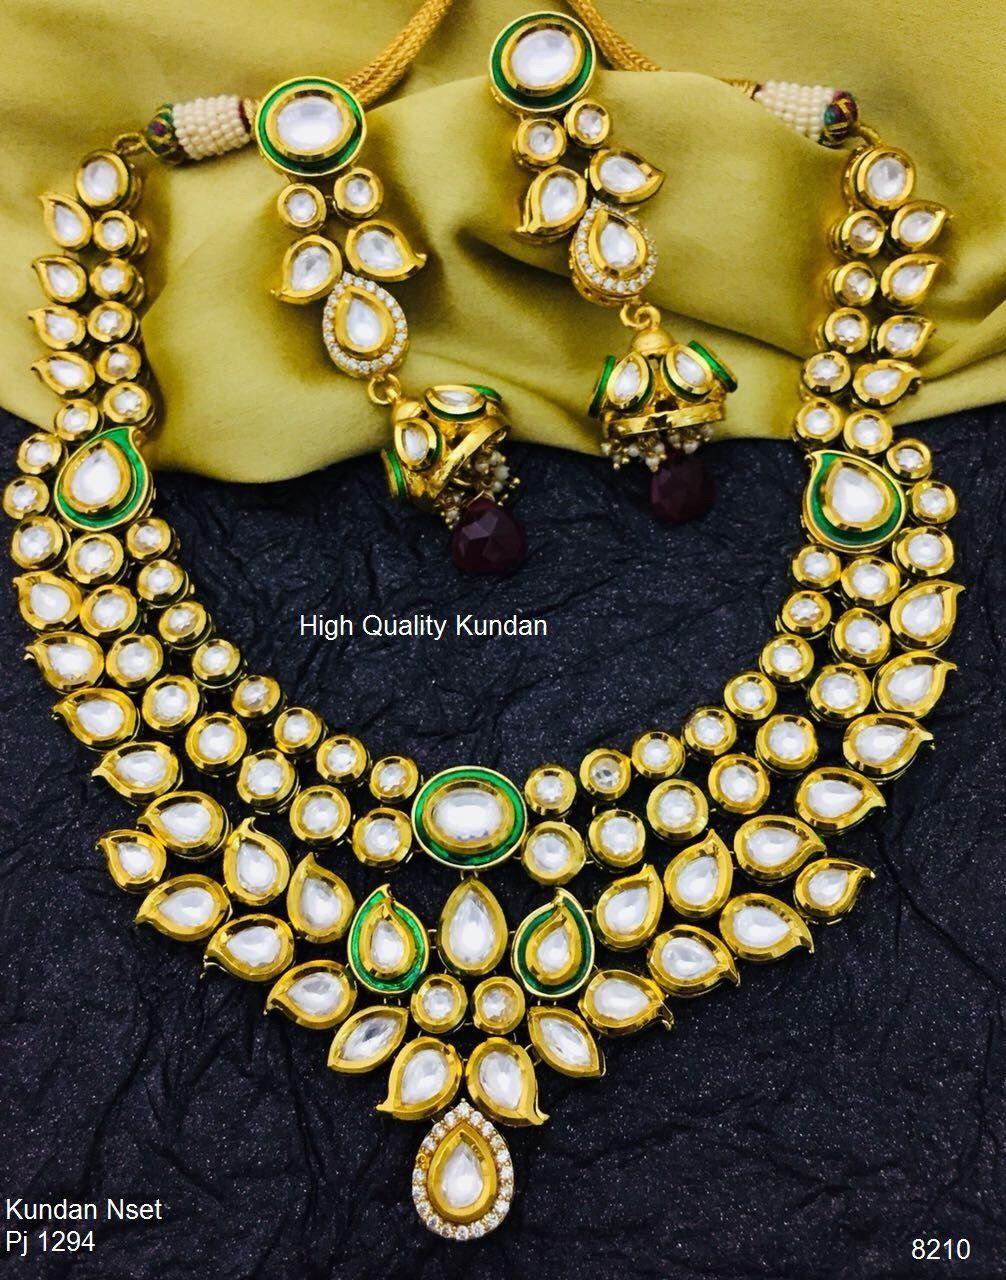 Kundan jewelry set in vibes pinterest jewelry kundan